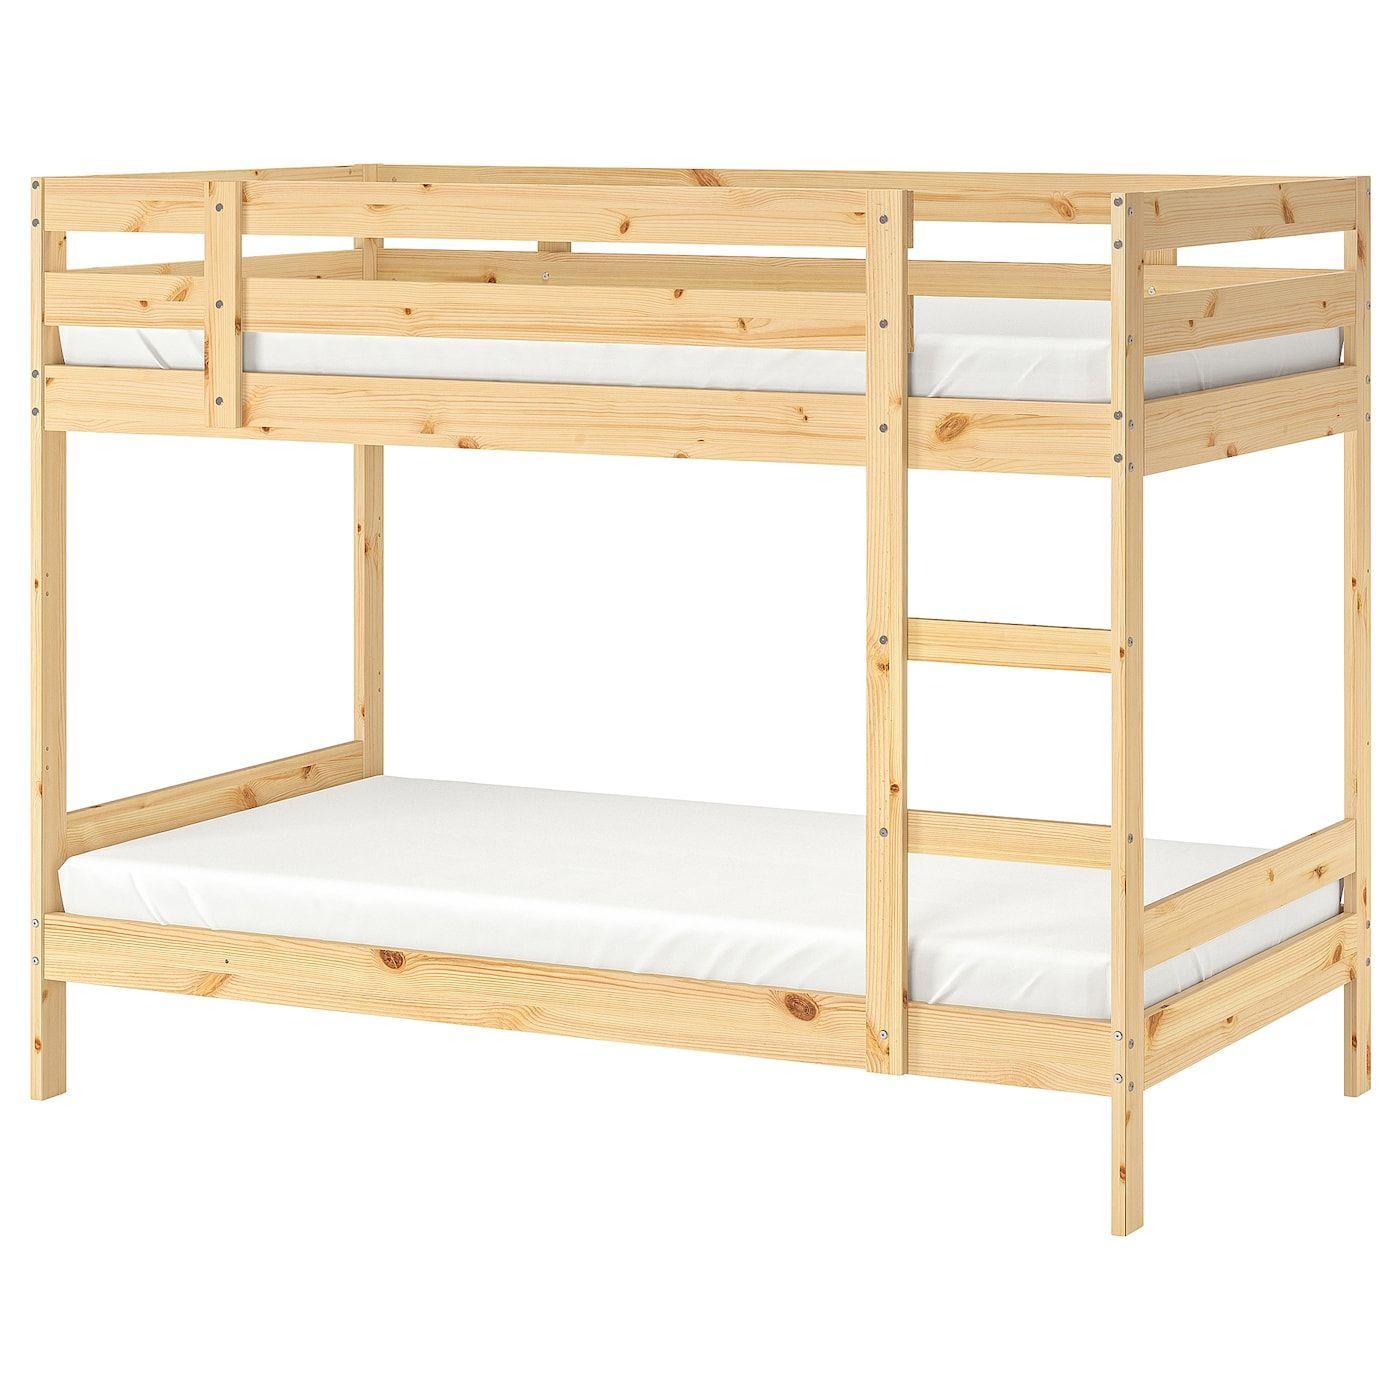 Mydal Bunk Bed Frame Pine Twin Ikea Bunk Beds Ikea Bunk Bed Single Bunk Bed